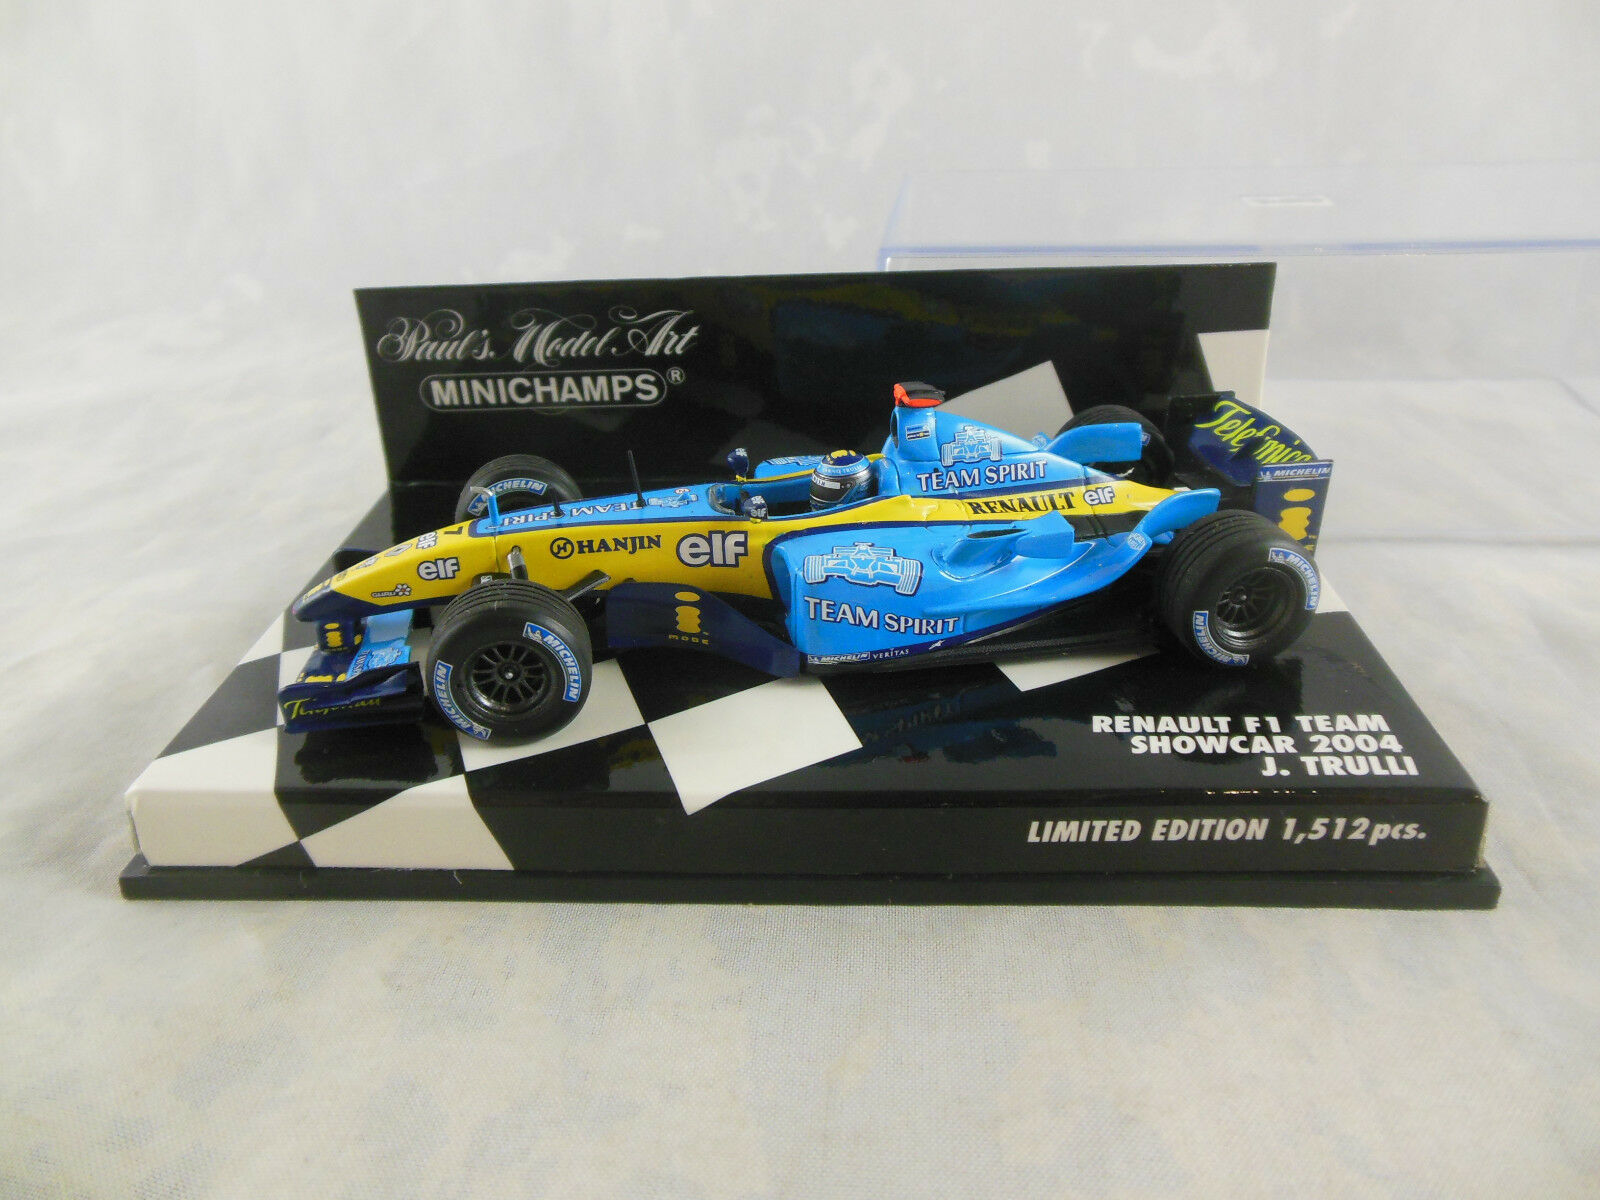 Minichamps 400 040097 2004 Renault F1 Team Showcar J Trulli